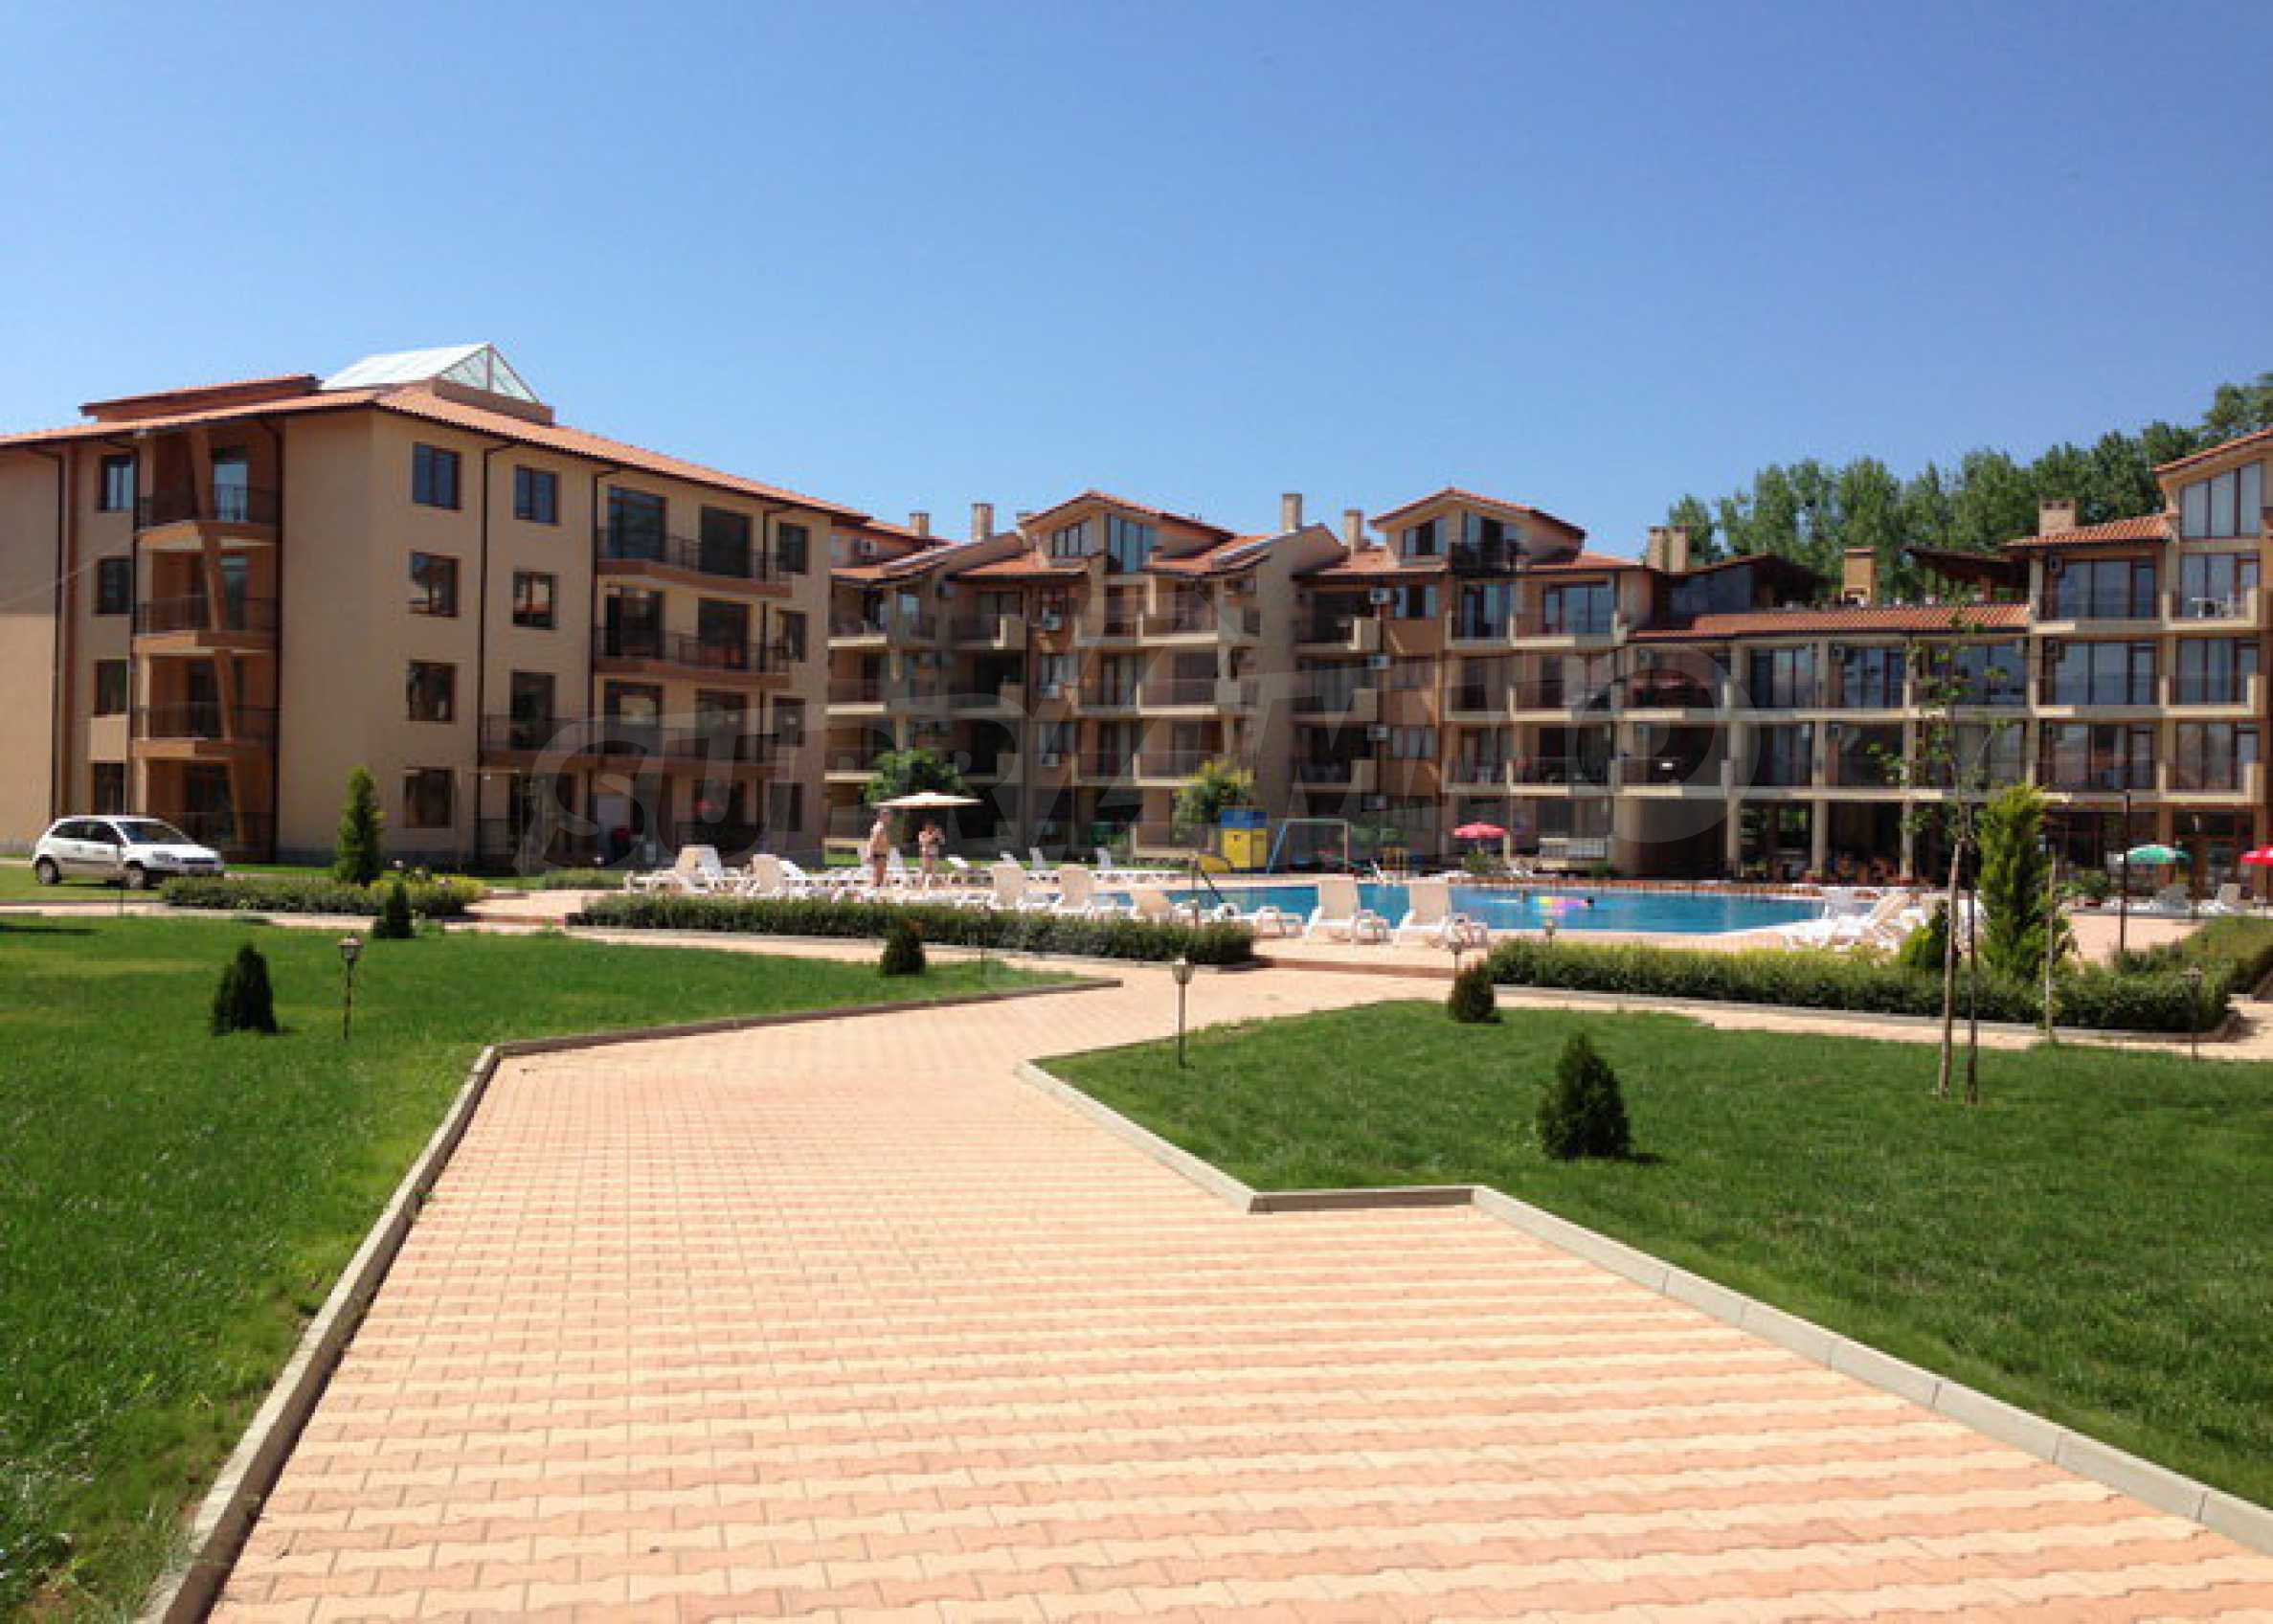 Studios und Apartments im Nestinarka-Komplex in Tsarevo 43